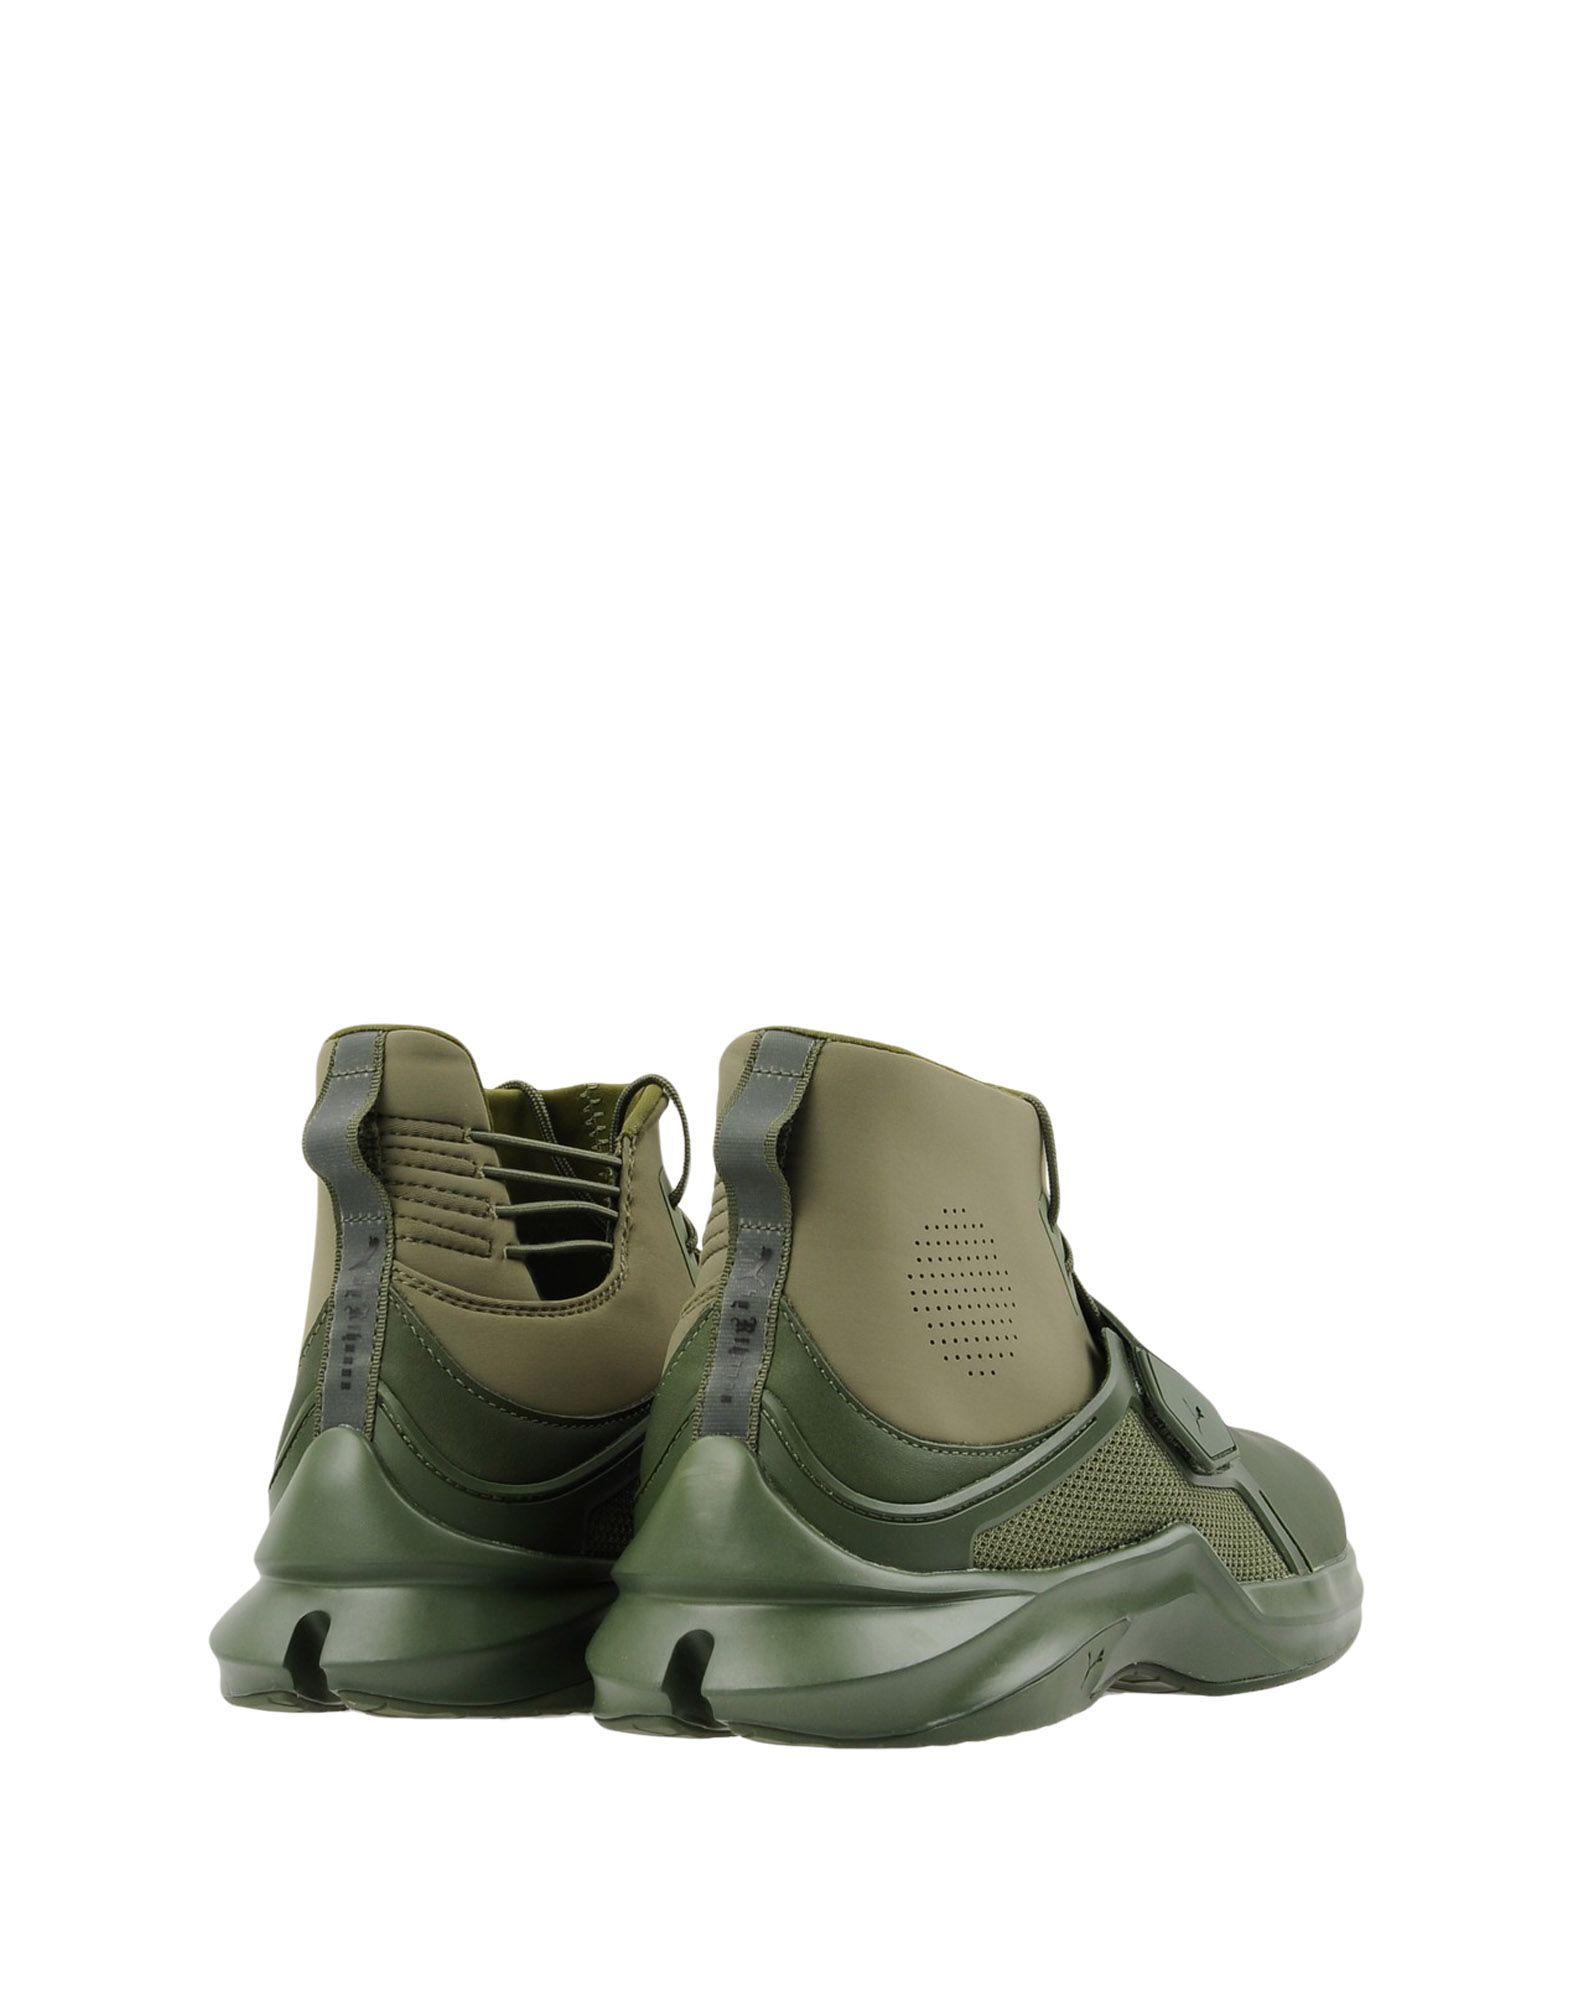 Fenty Puma By Rihanna The Trainer Hi  By Fenty  Hi 11292458UP Gute Qualität beliebte Schuhe 6cdb84